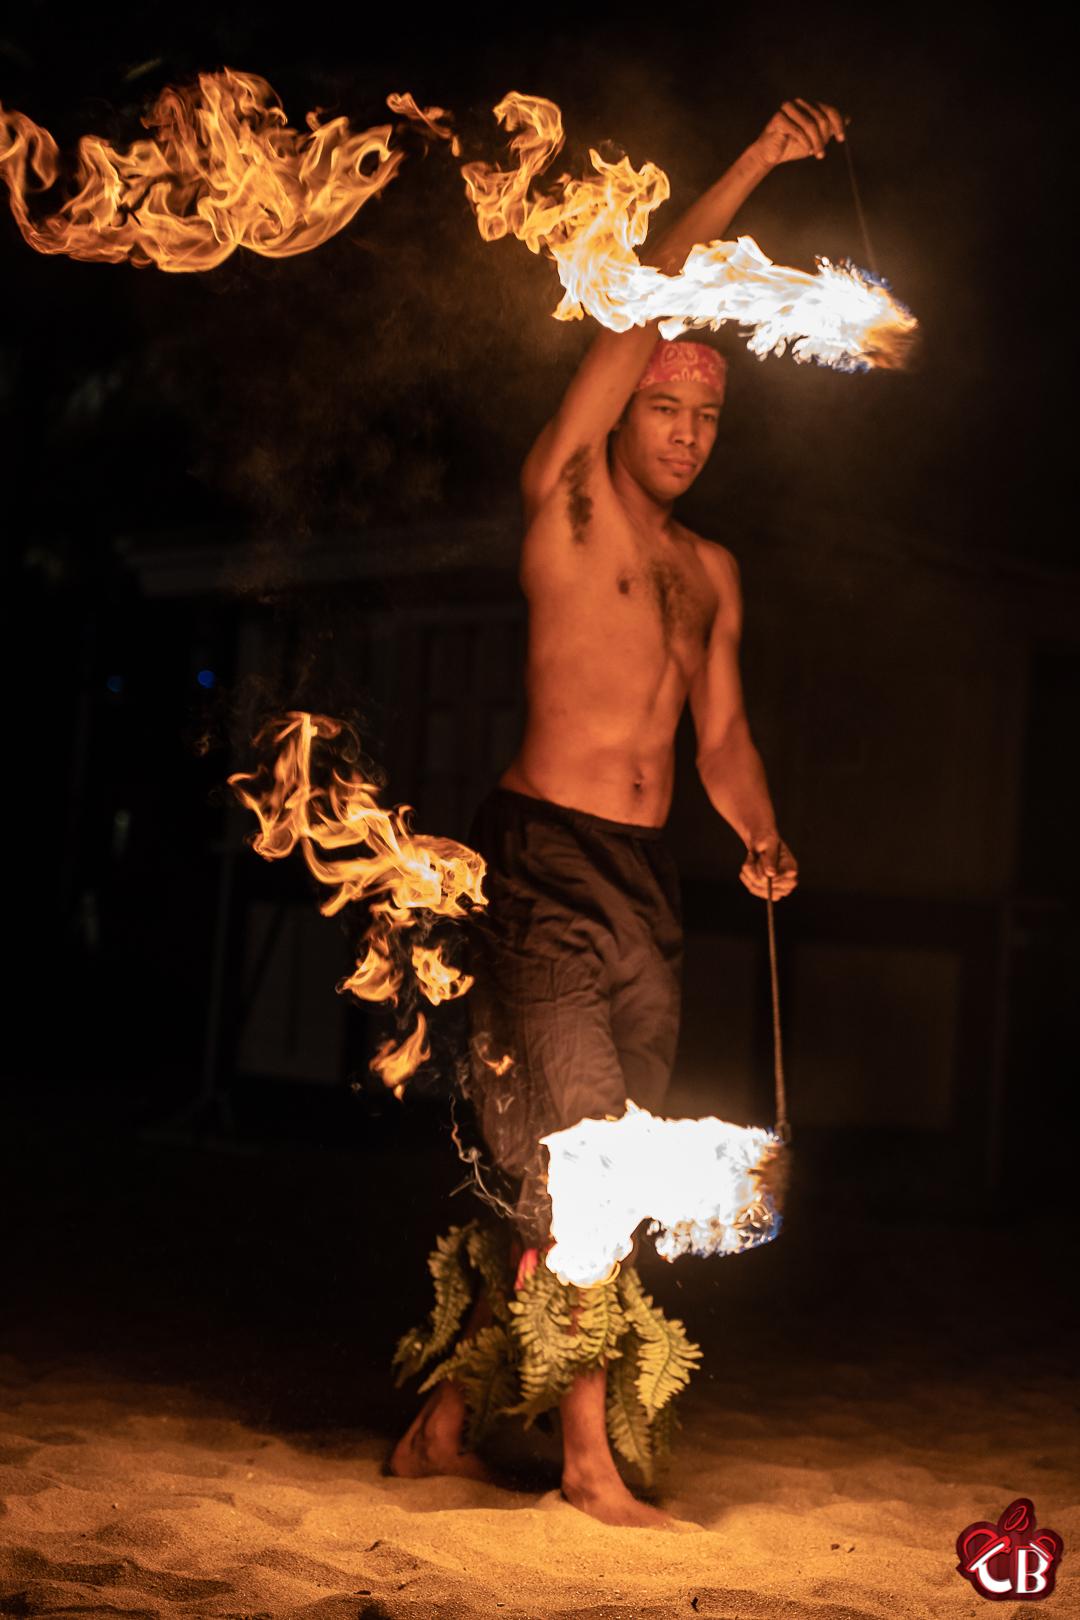 B South Fort Laud Fireshow-1.jpg